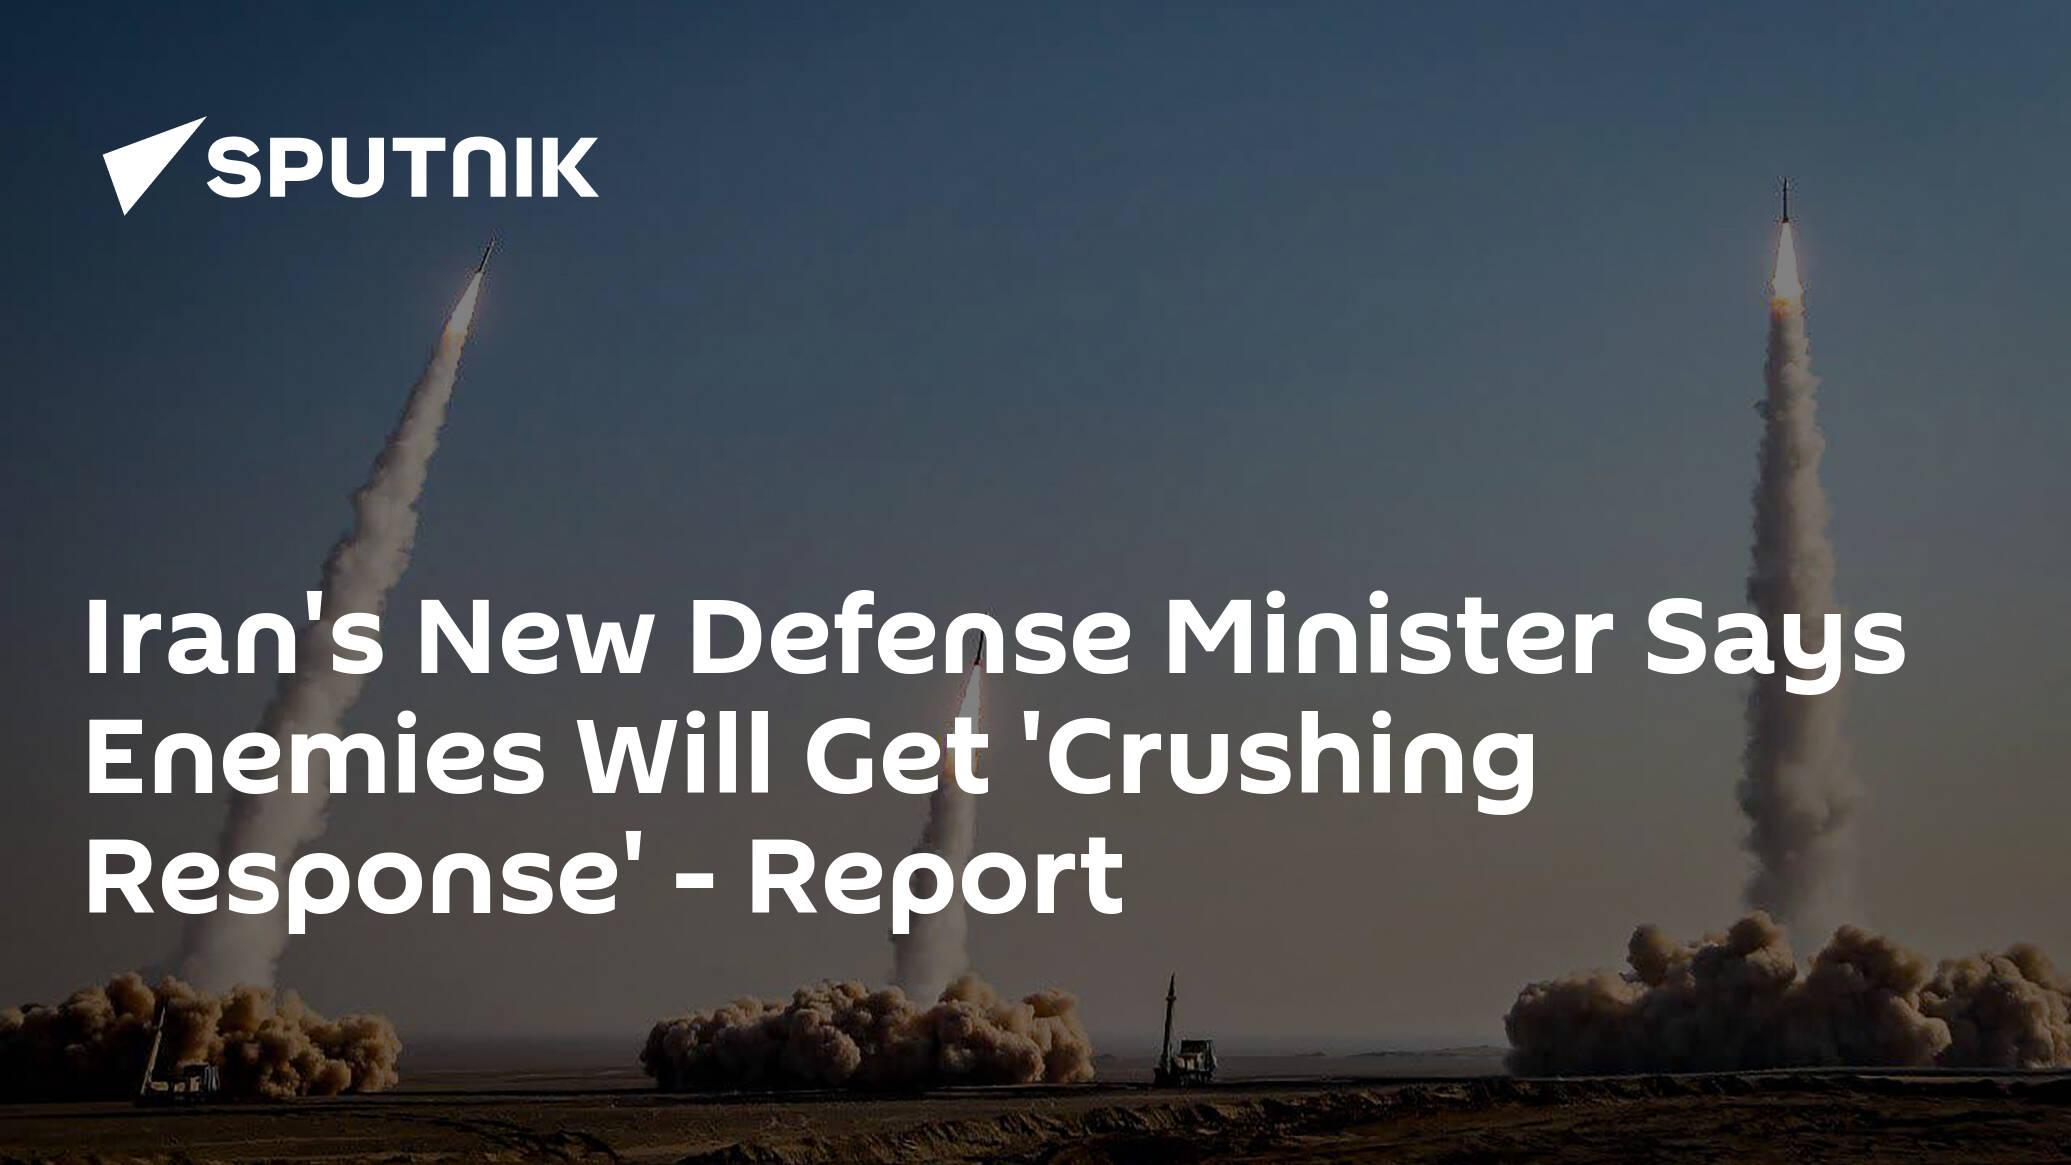 Iran's New Defense Minister Says Enemies Will Get 'Crushing Response'